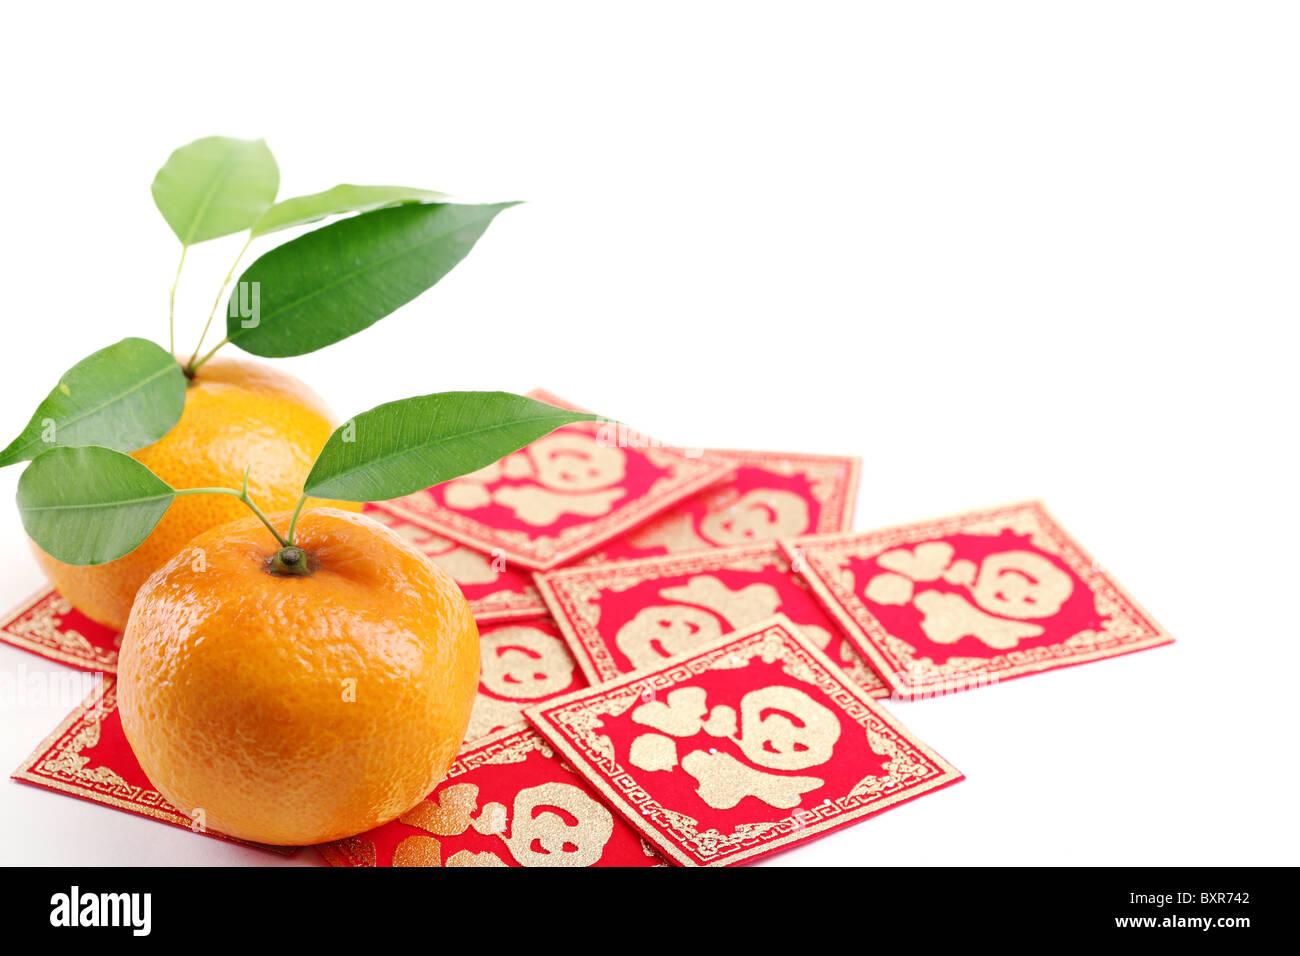 Mandarin oranges and 'Fu' Character,Closeup. - Stock Image